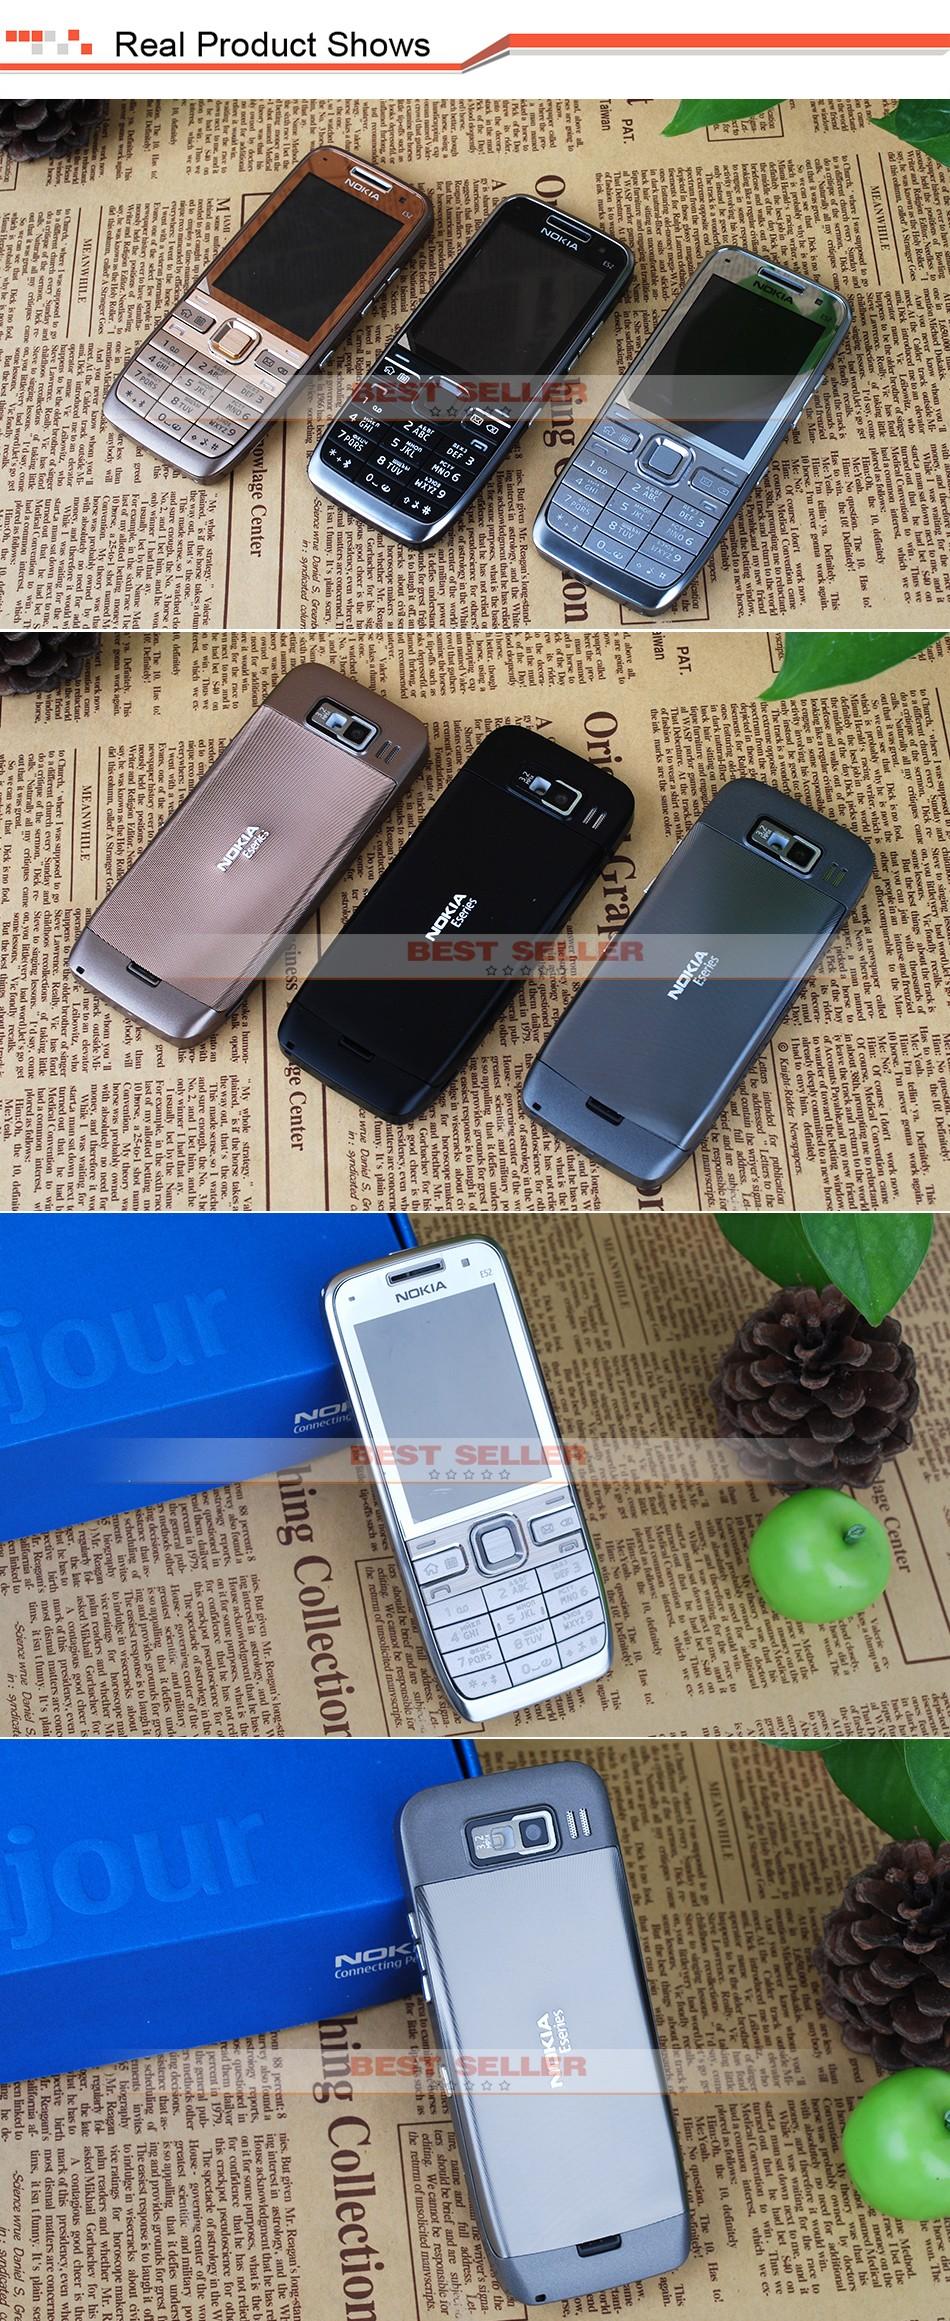 Refurbished phone Original Unlocked Nokia E52 GSM WCDMA cell phone Wifi Bluetooth GPS 3.2MP Camera black 4